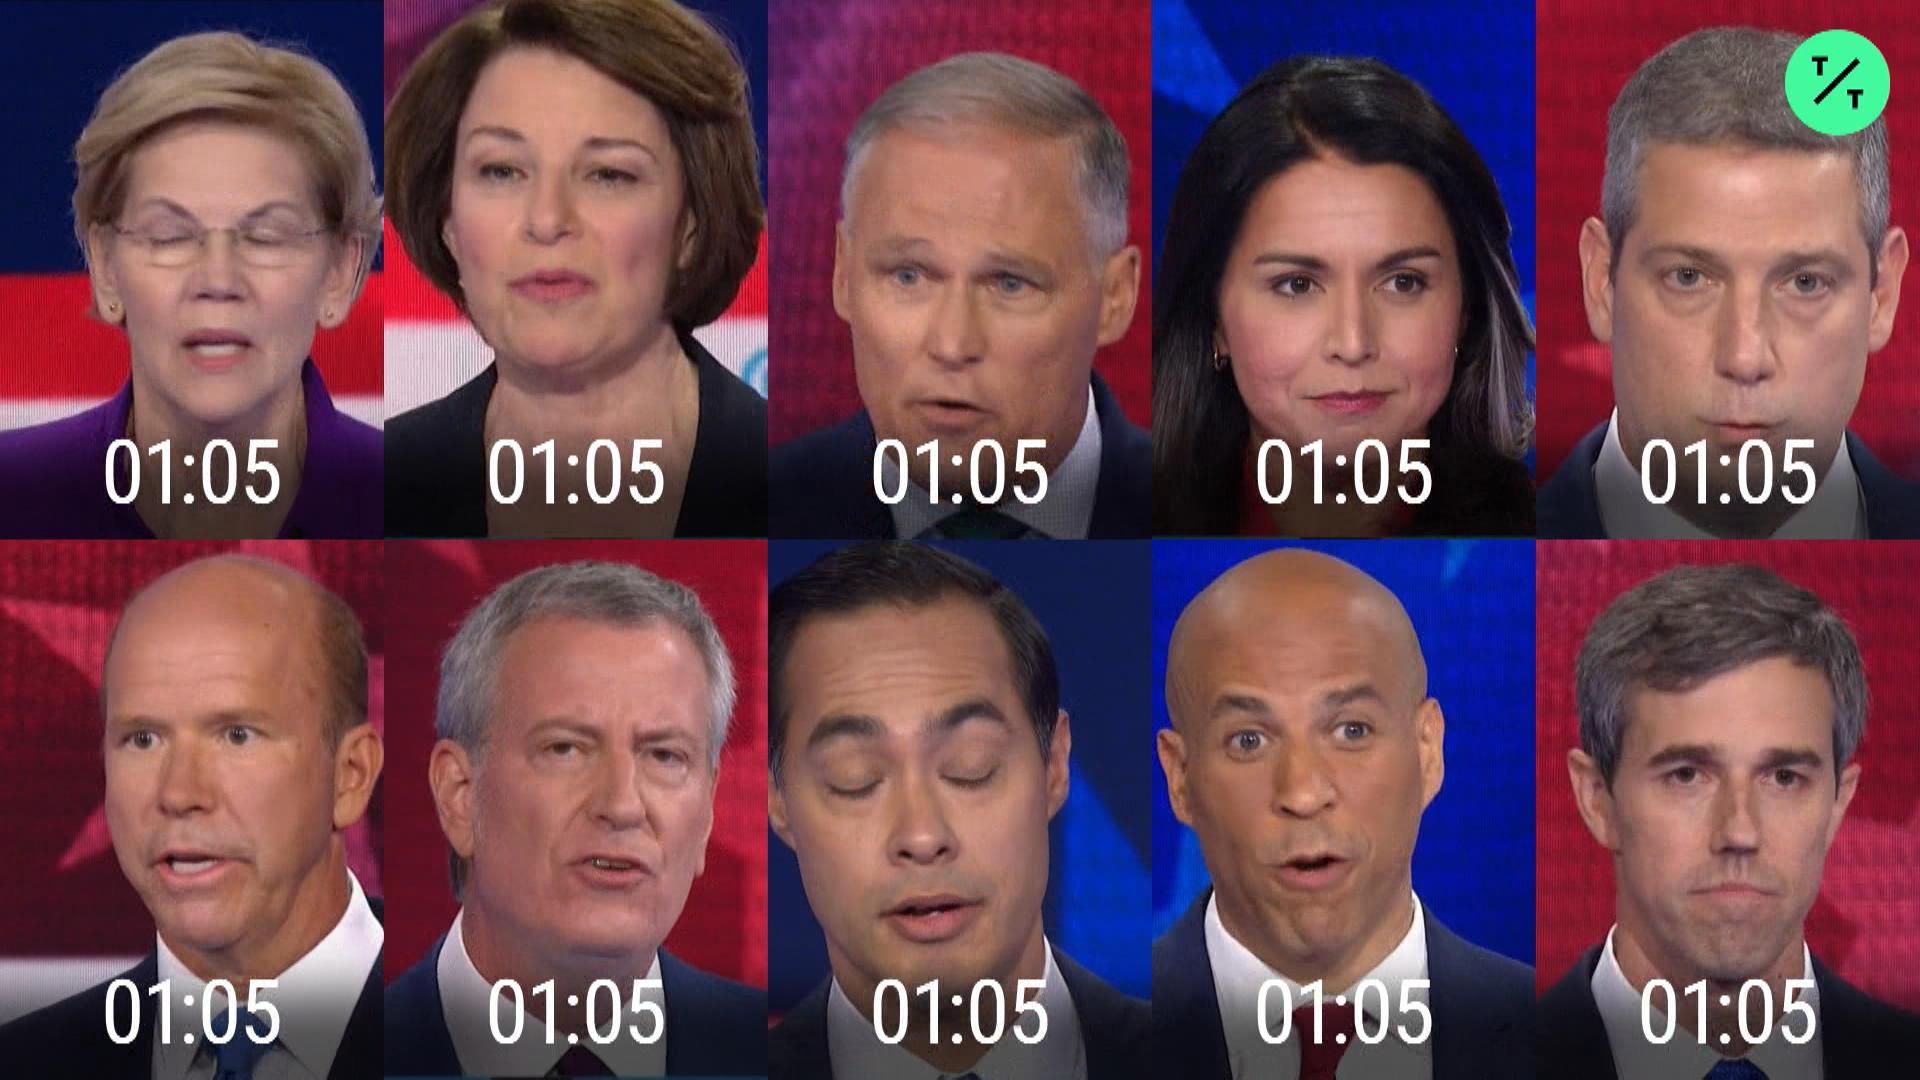 Democrats Speaking Time